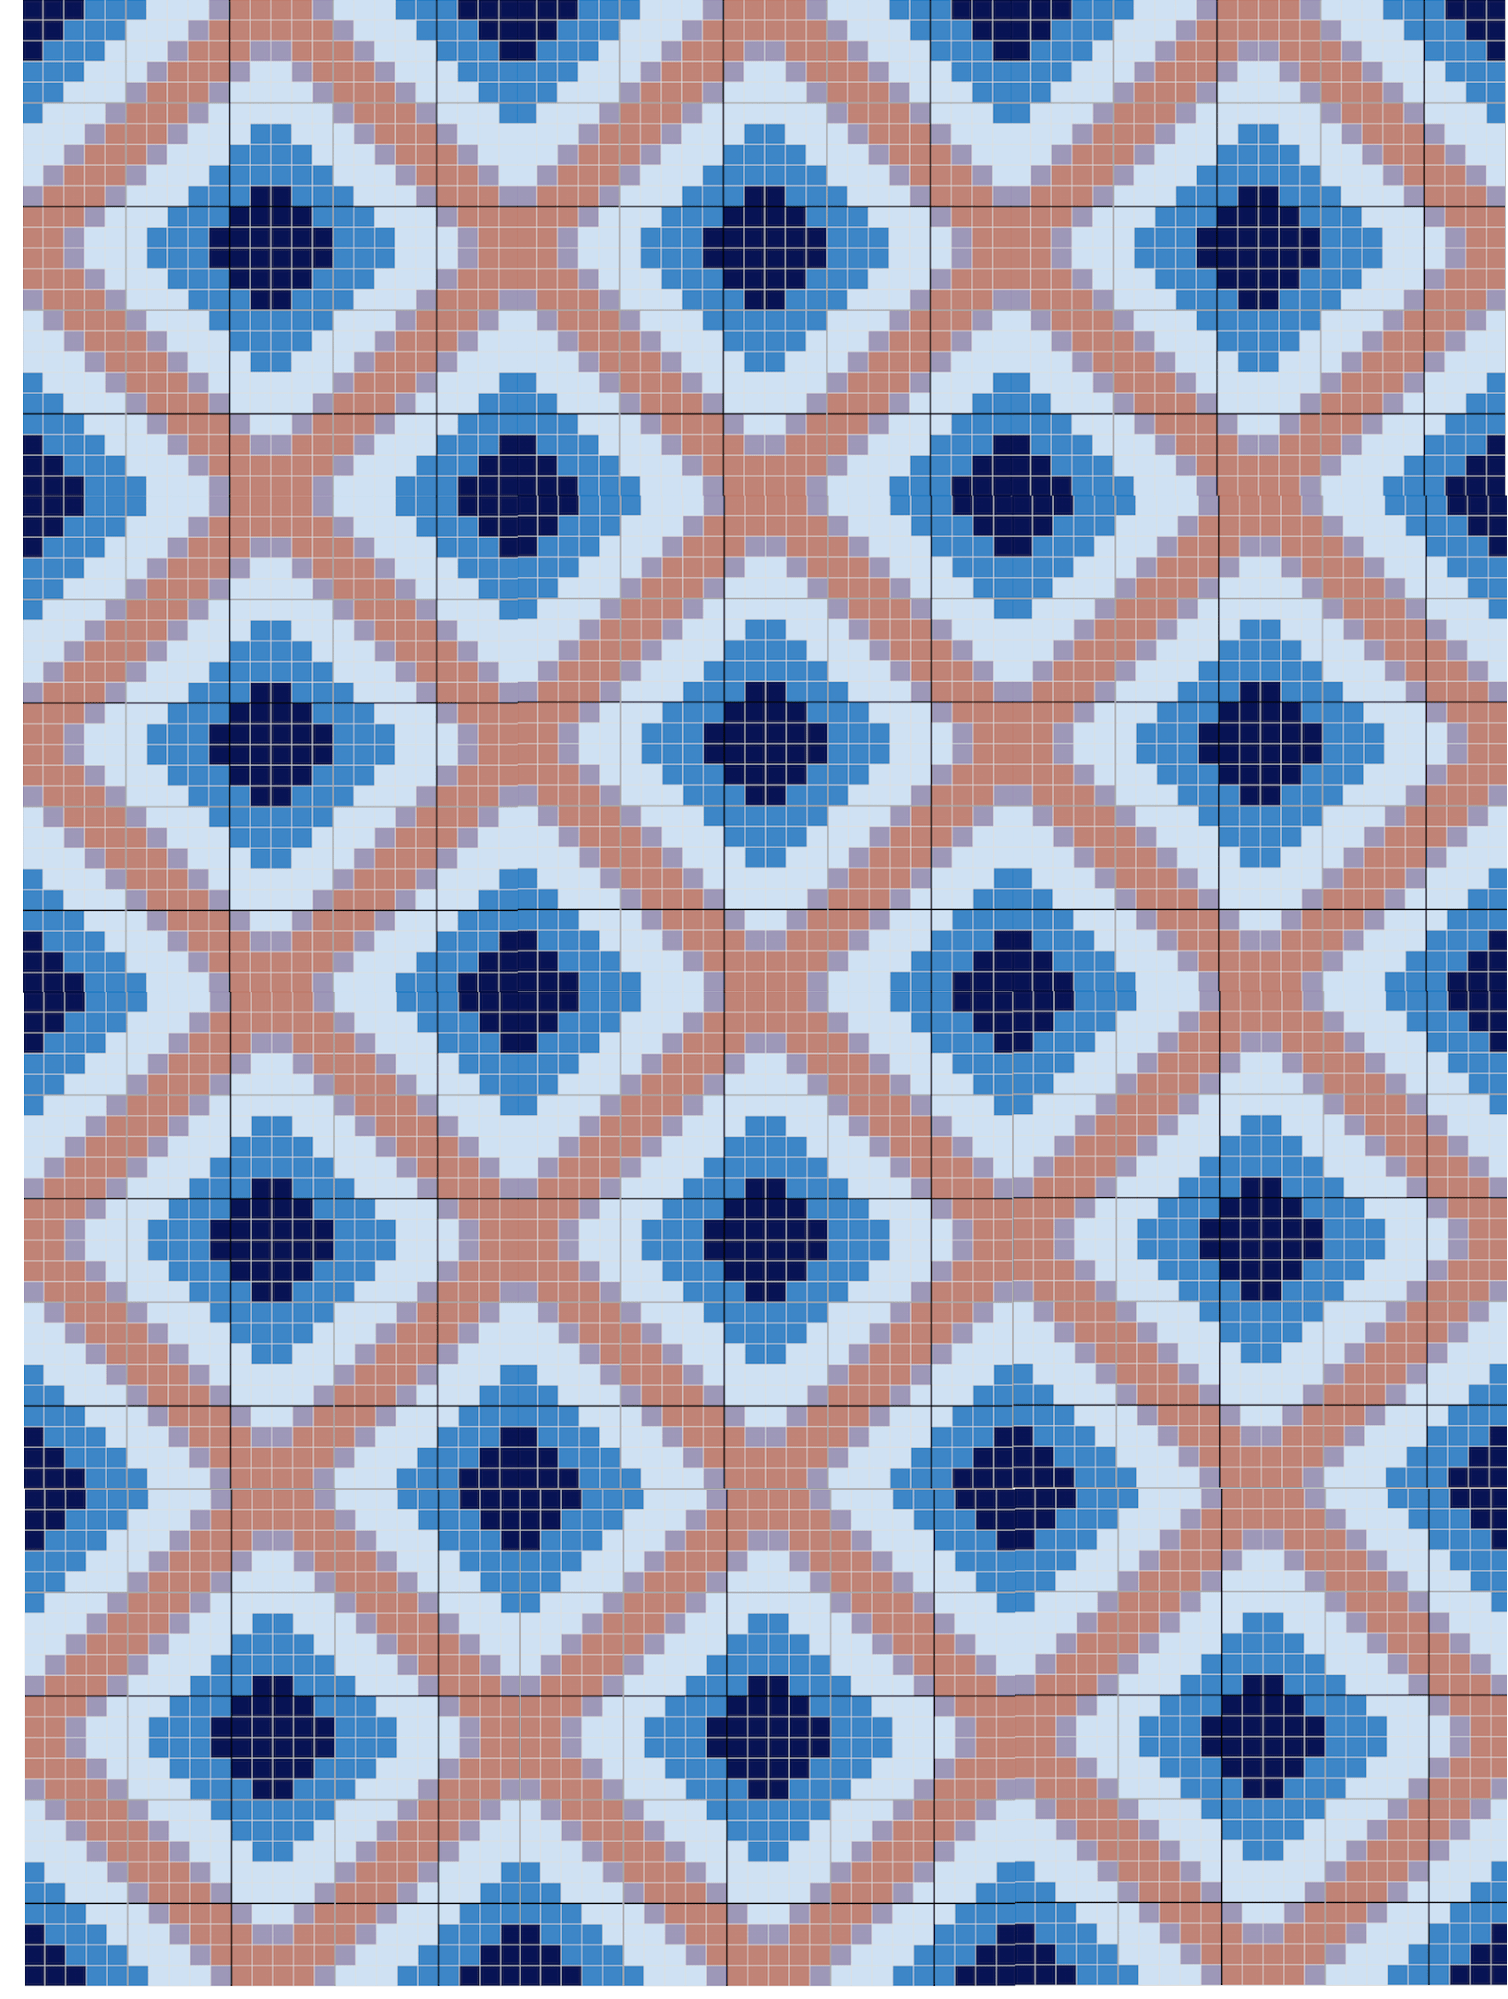 c2c crochet graphgan blanket pattern